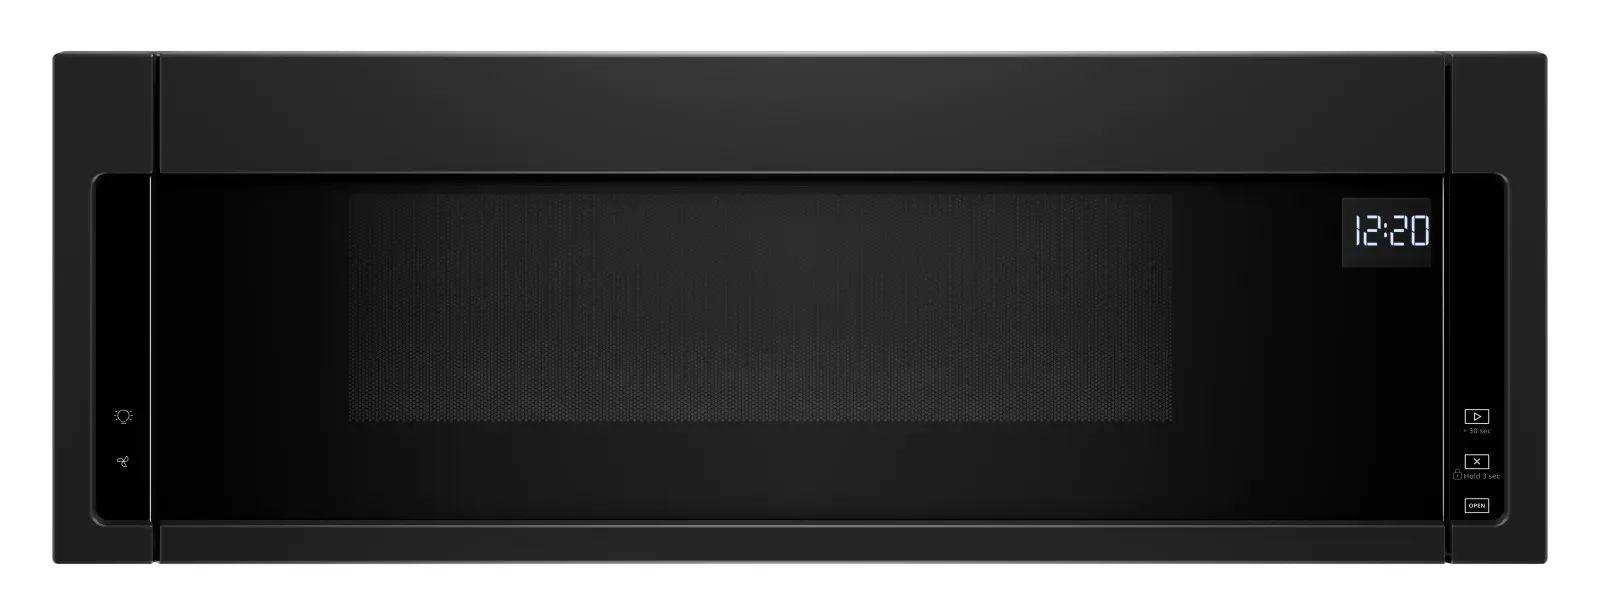 whirlpool 30 inch 1 1 cu ft low profile microwave hood combination in black ywml55011hb